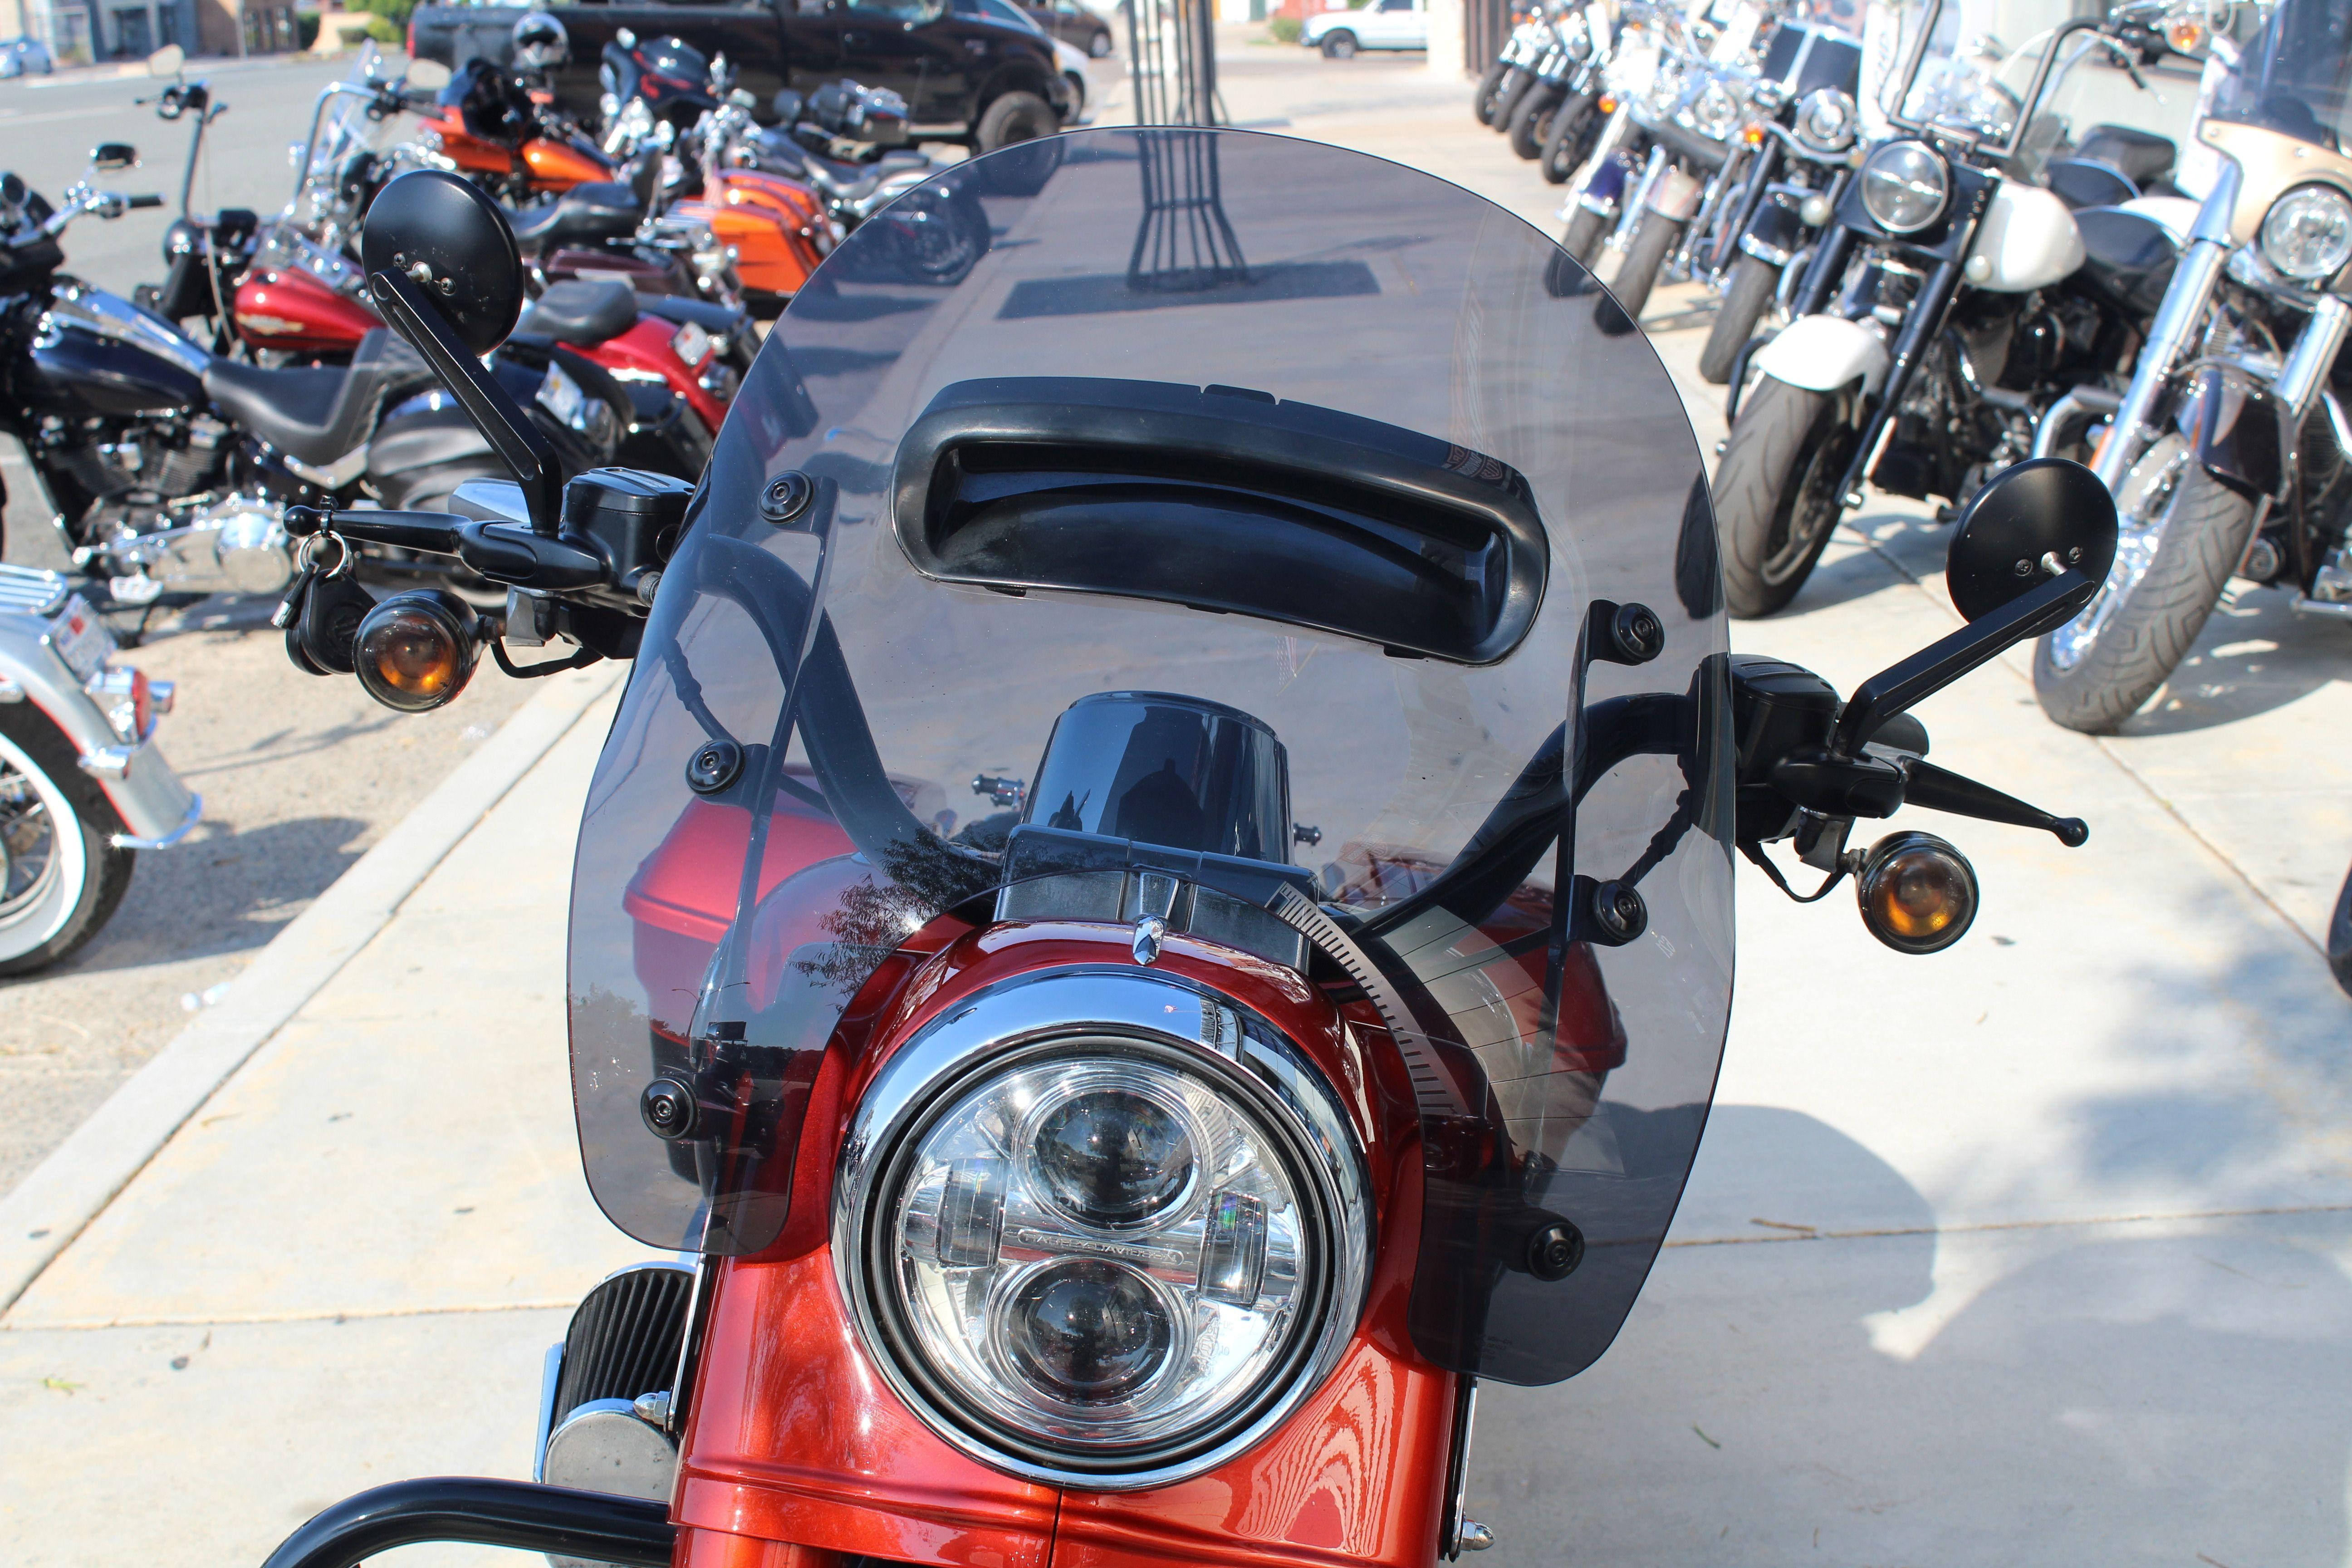 Pre-Owned 2014 Harley-Davidson CVO Road King